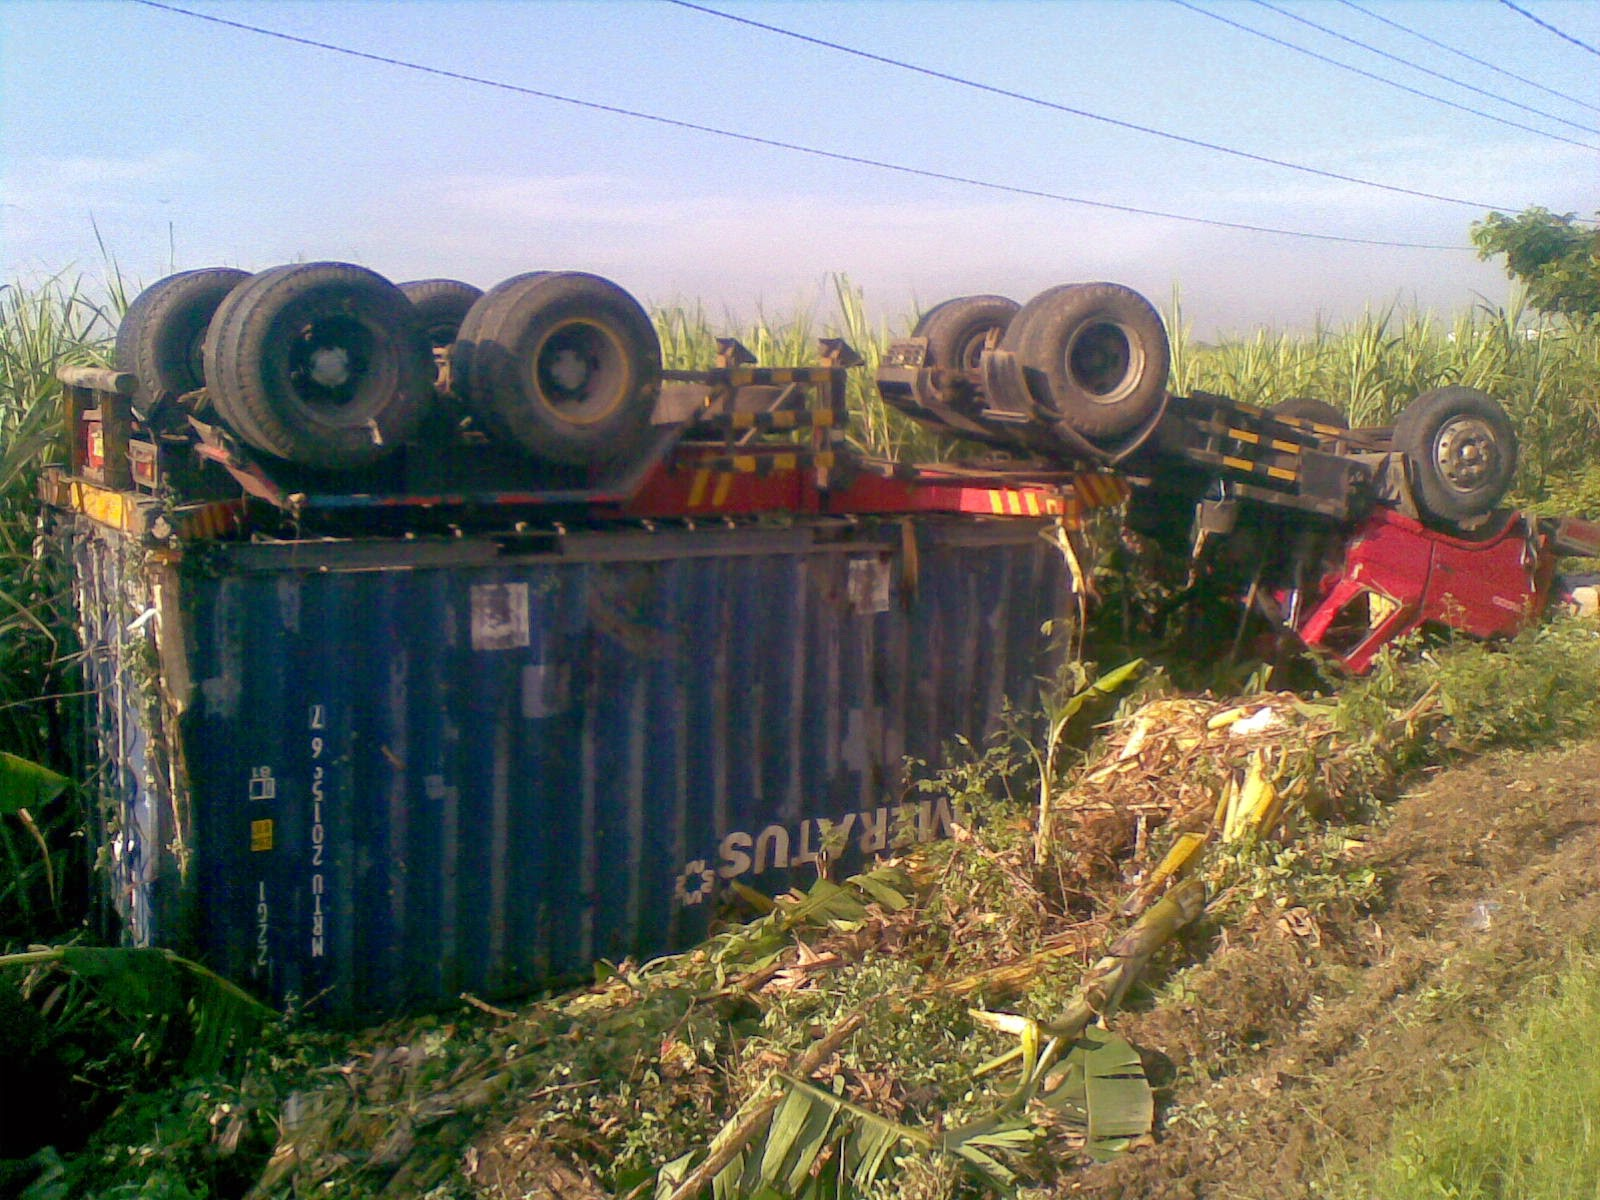 Kecelakaan di Jalur Pantura Pati Juana Purworejo Widoro Kandang